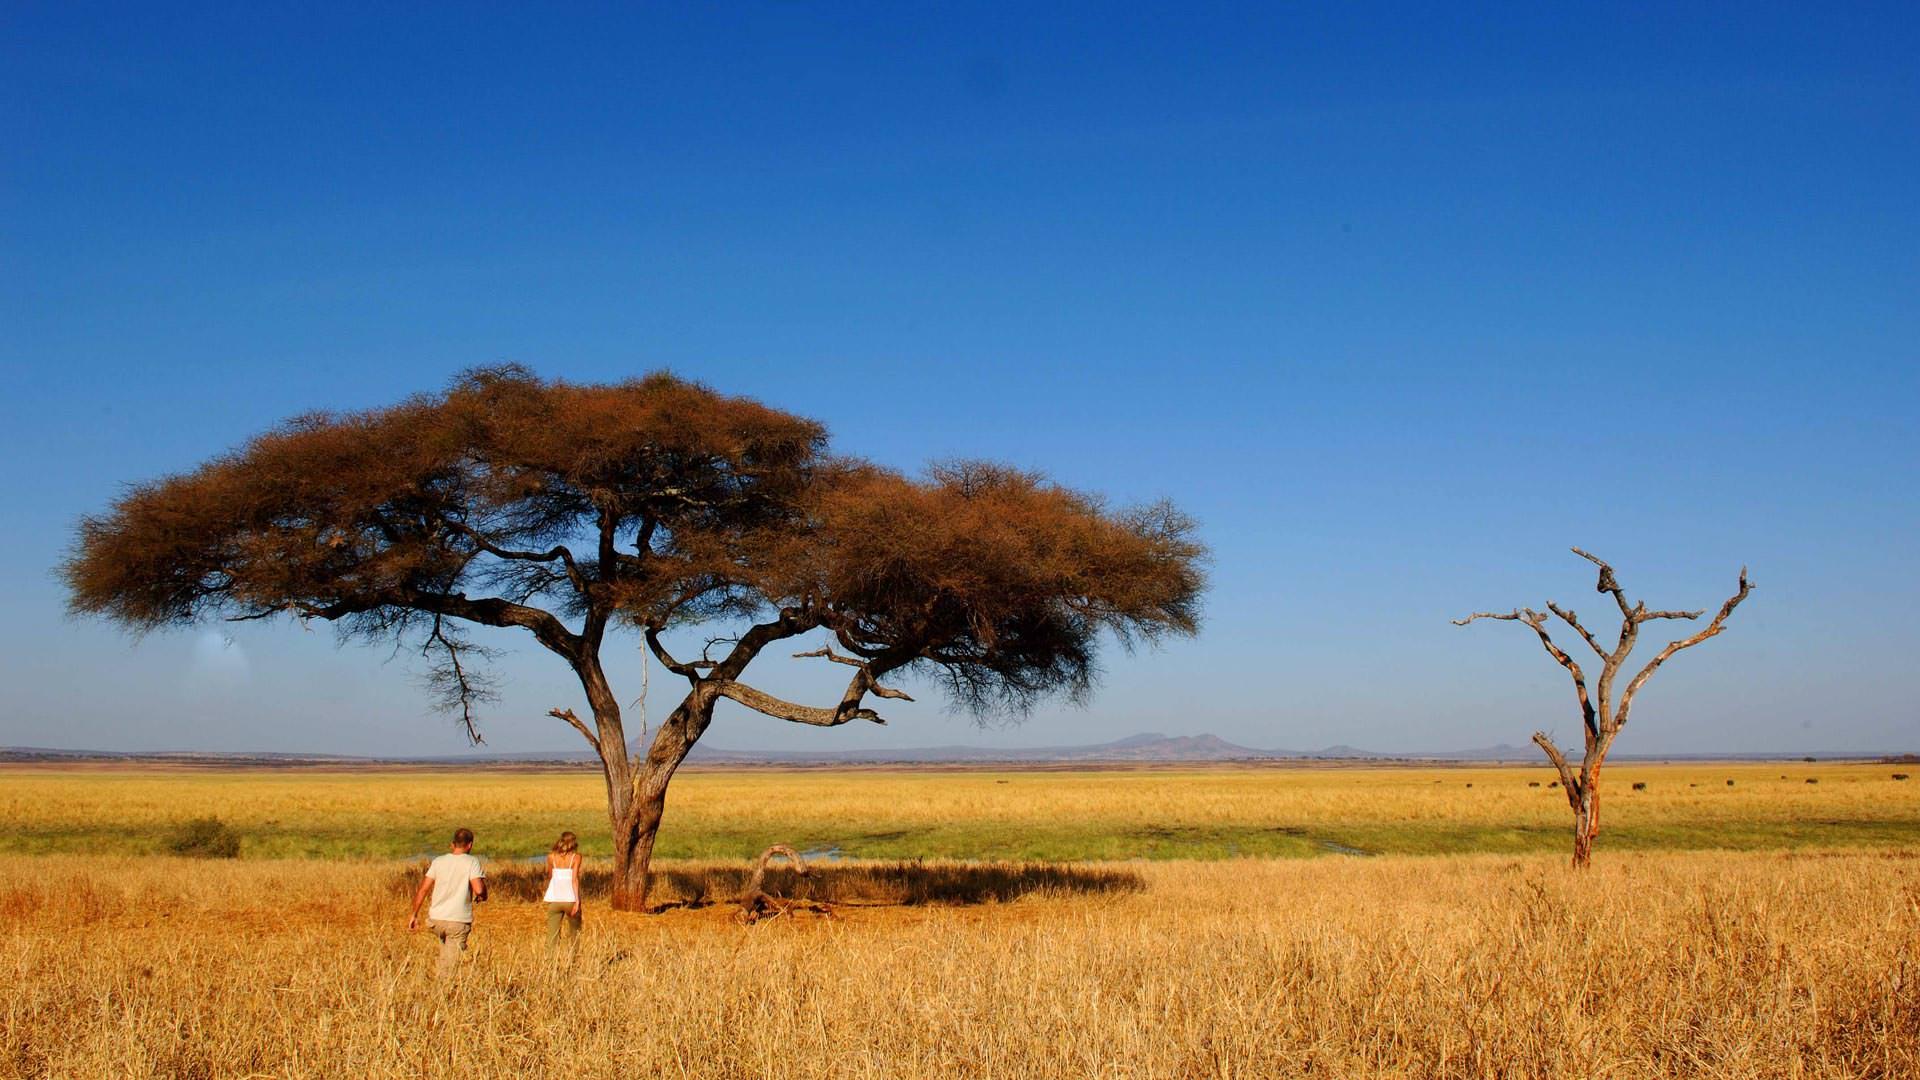 Tarangire view - at Silalei